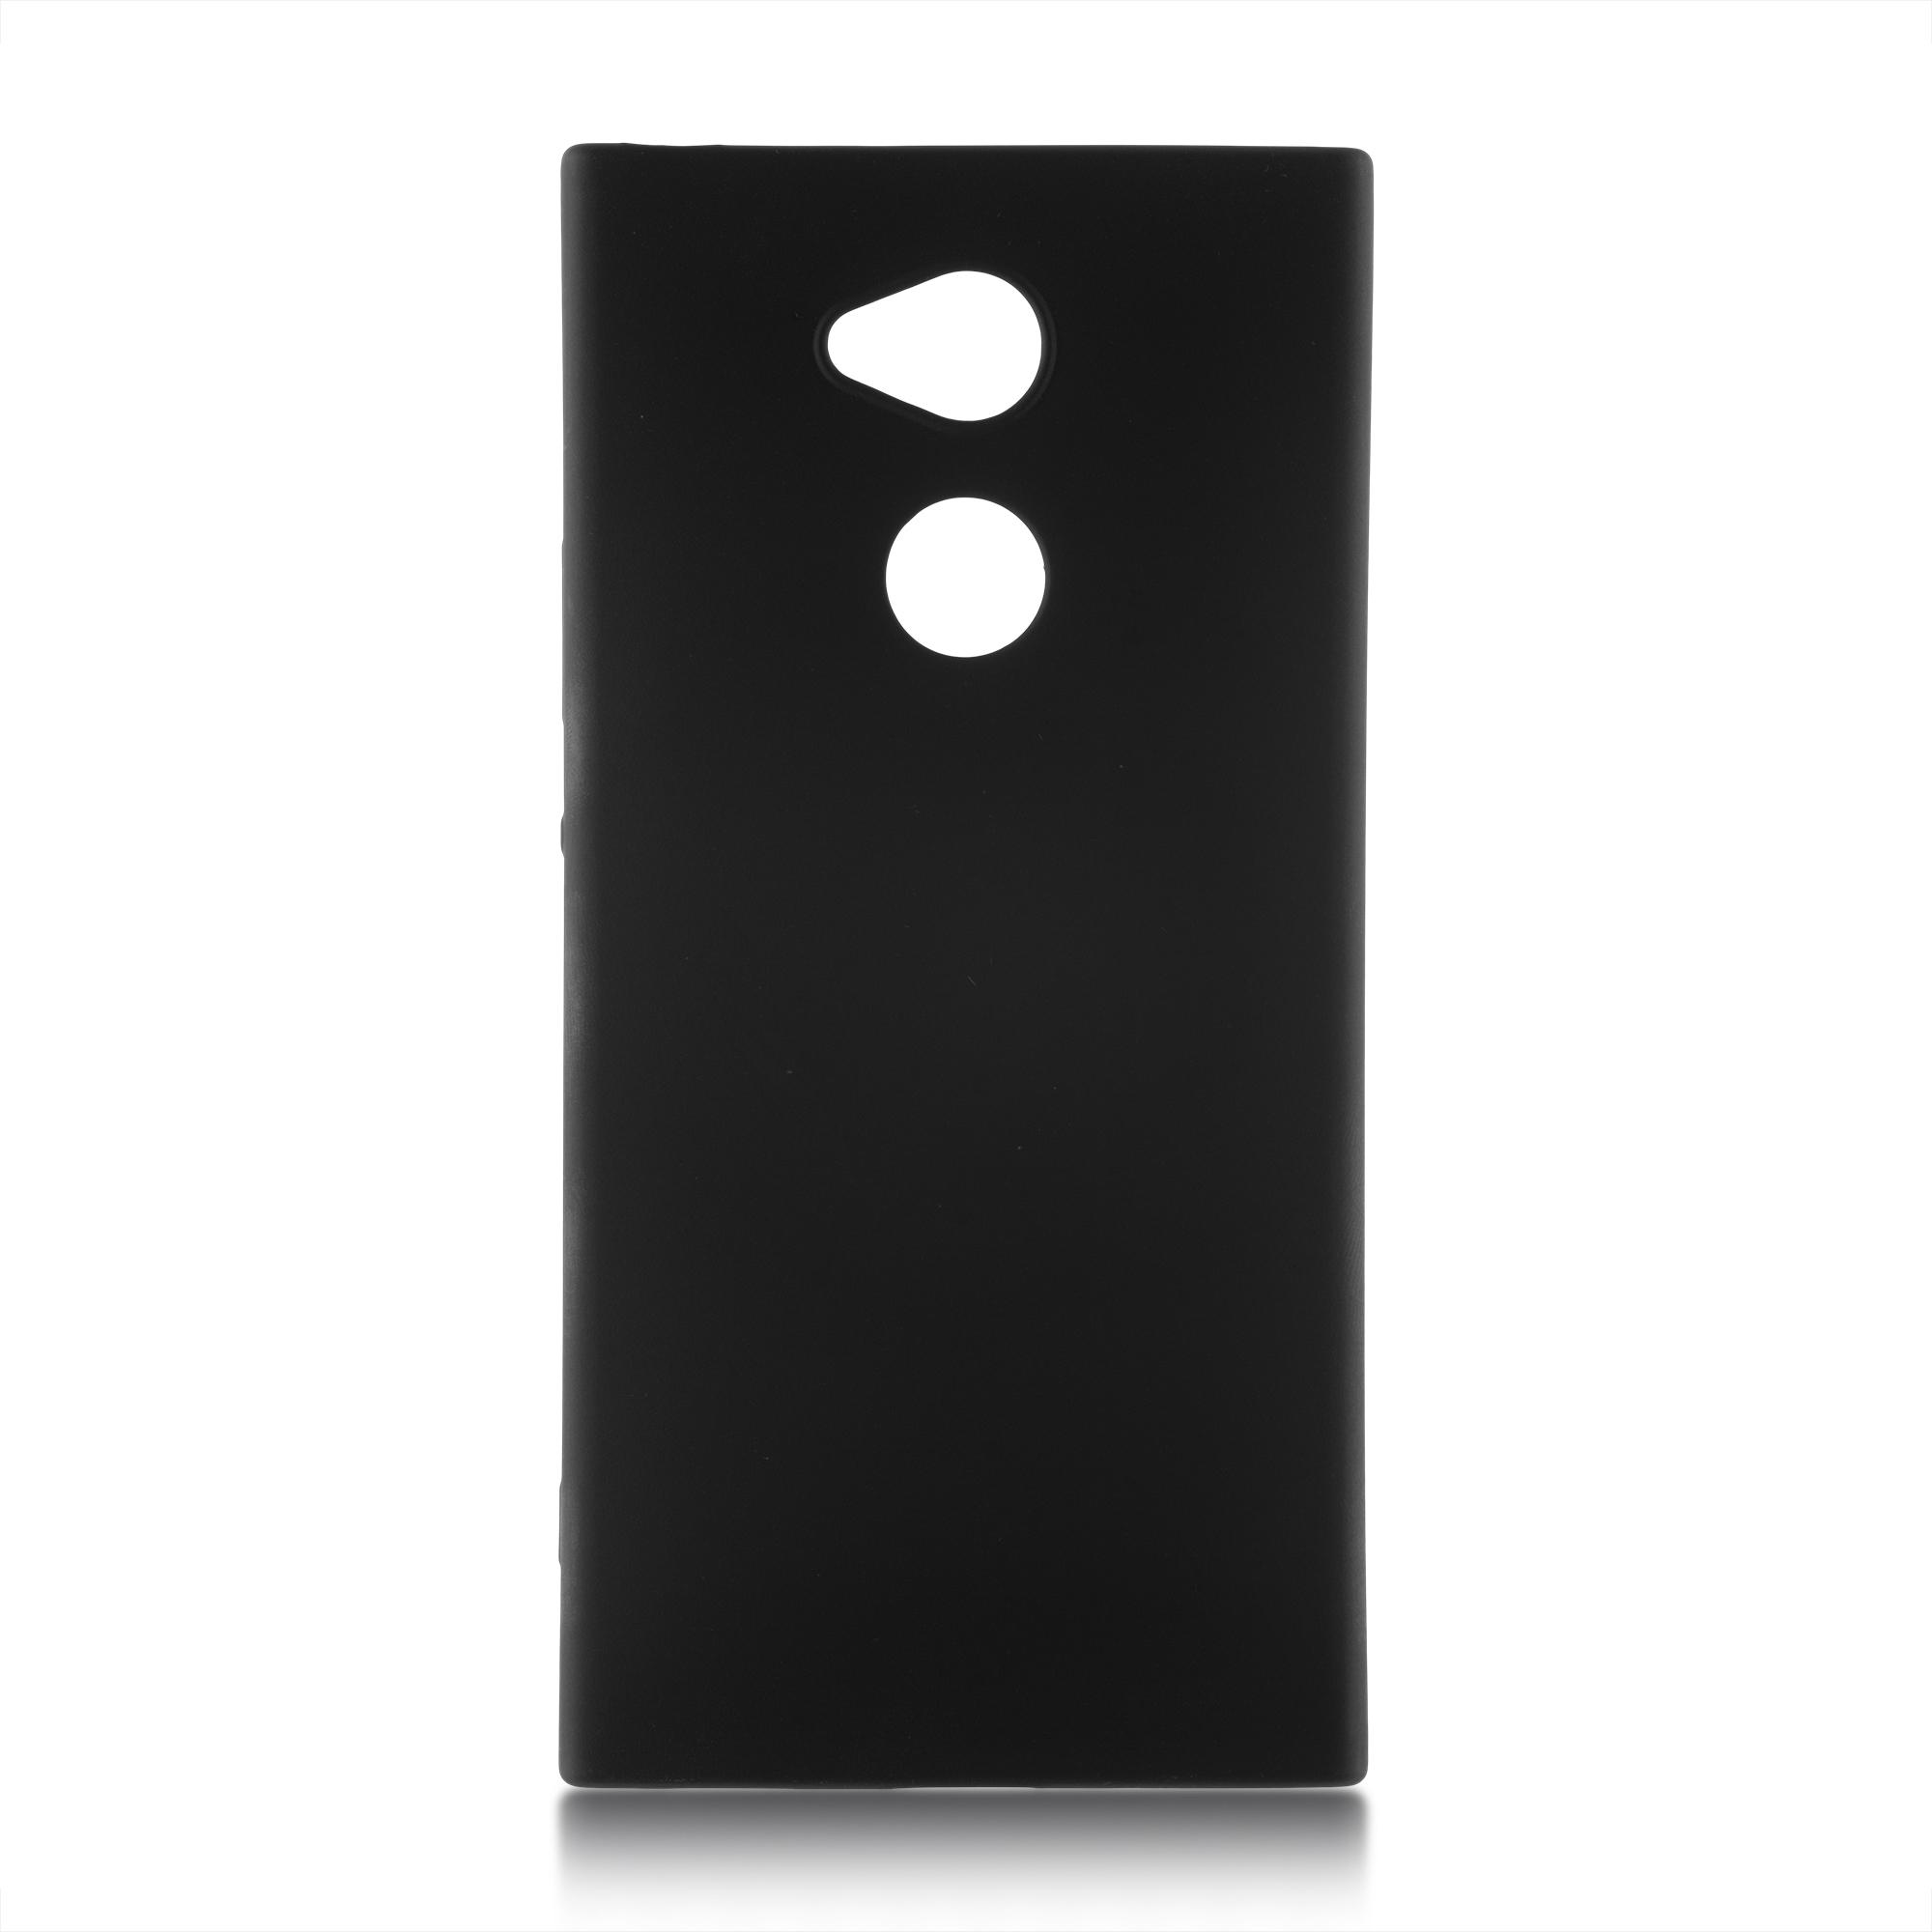 Чехол Brosco Colourful для Sony Xperia XA2 Ultra, черный